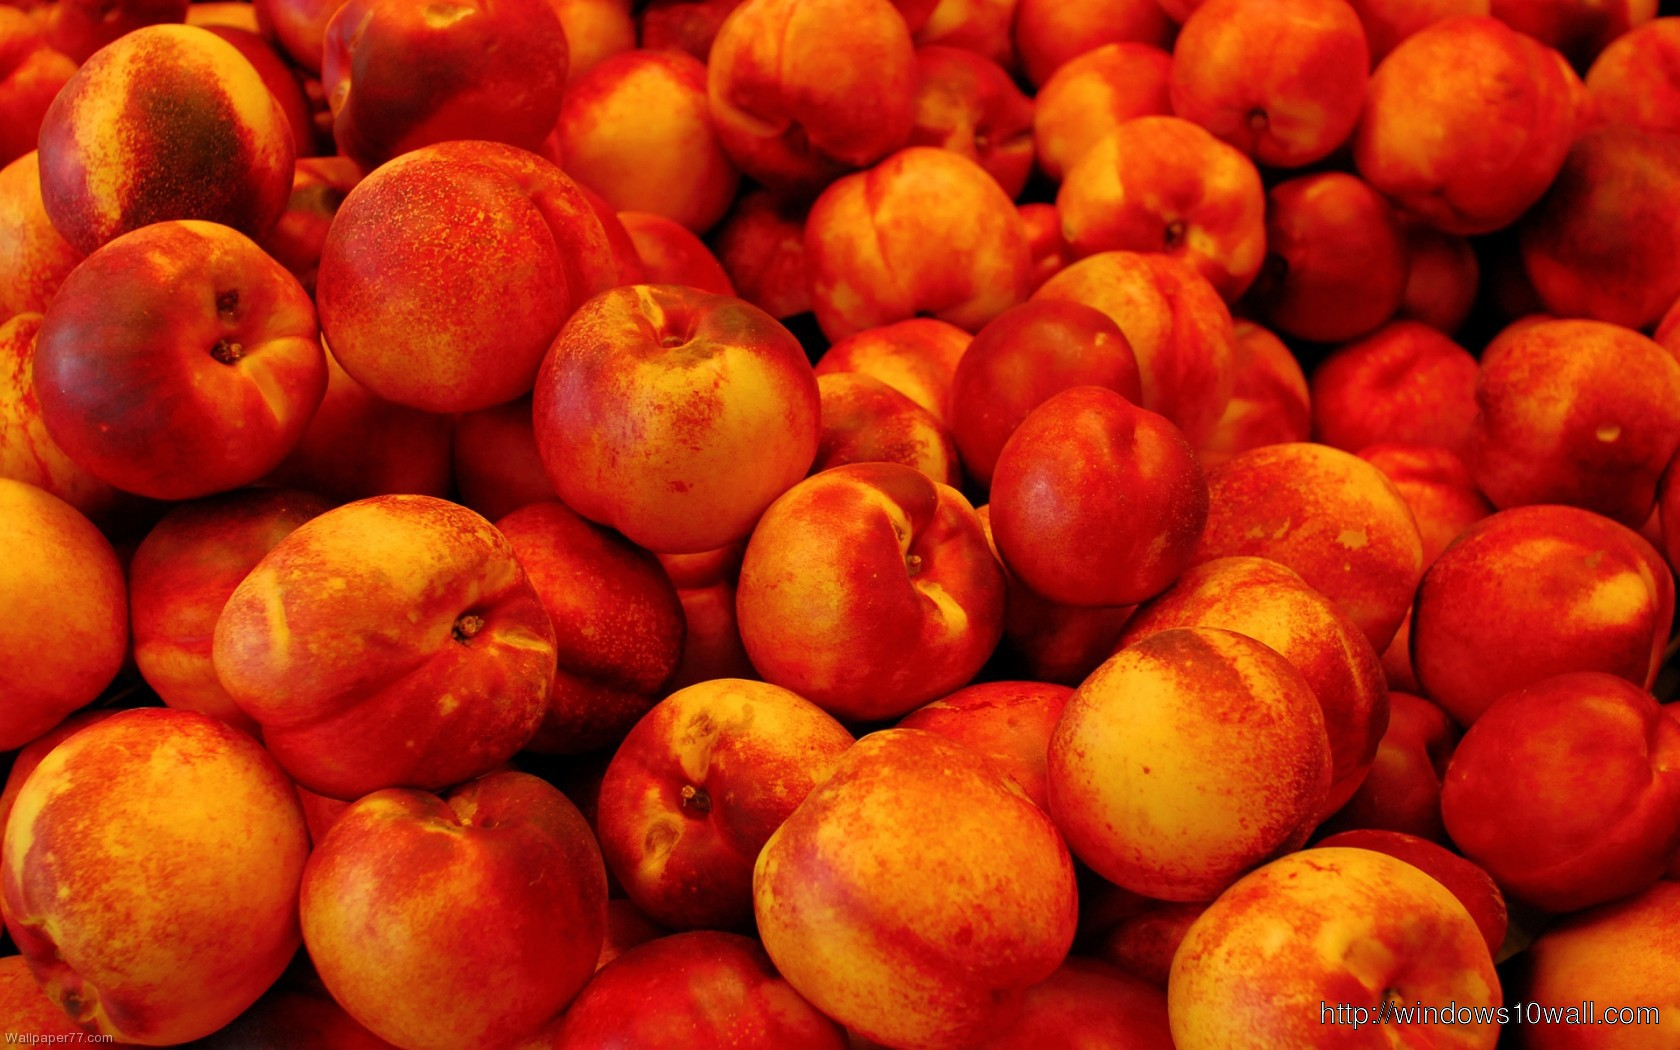 fruits-wallpaper-full-size